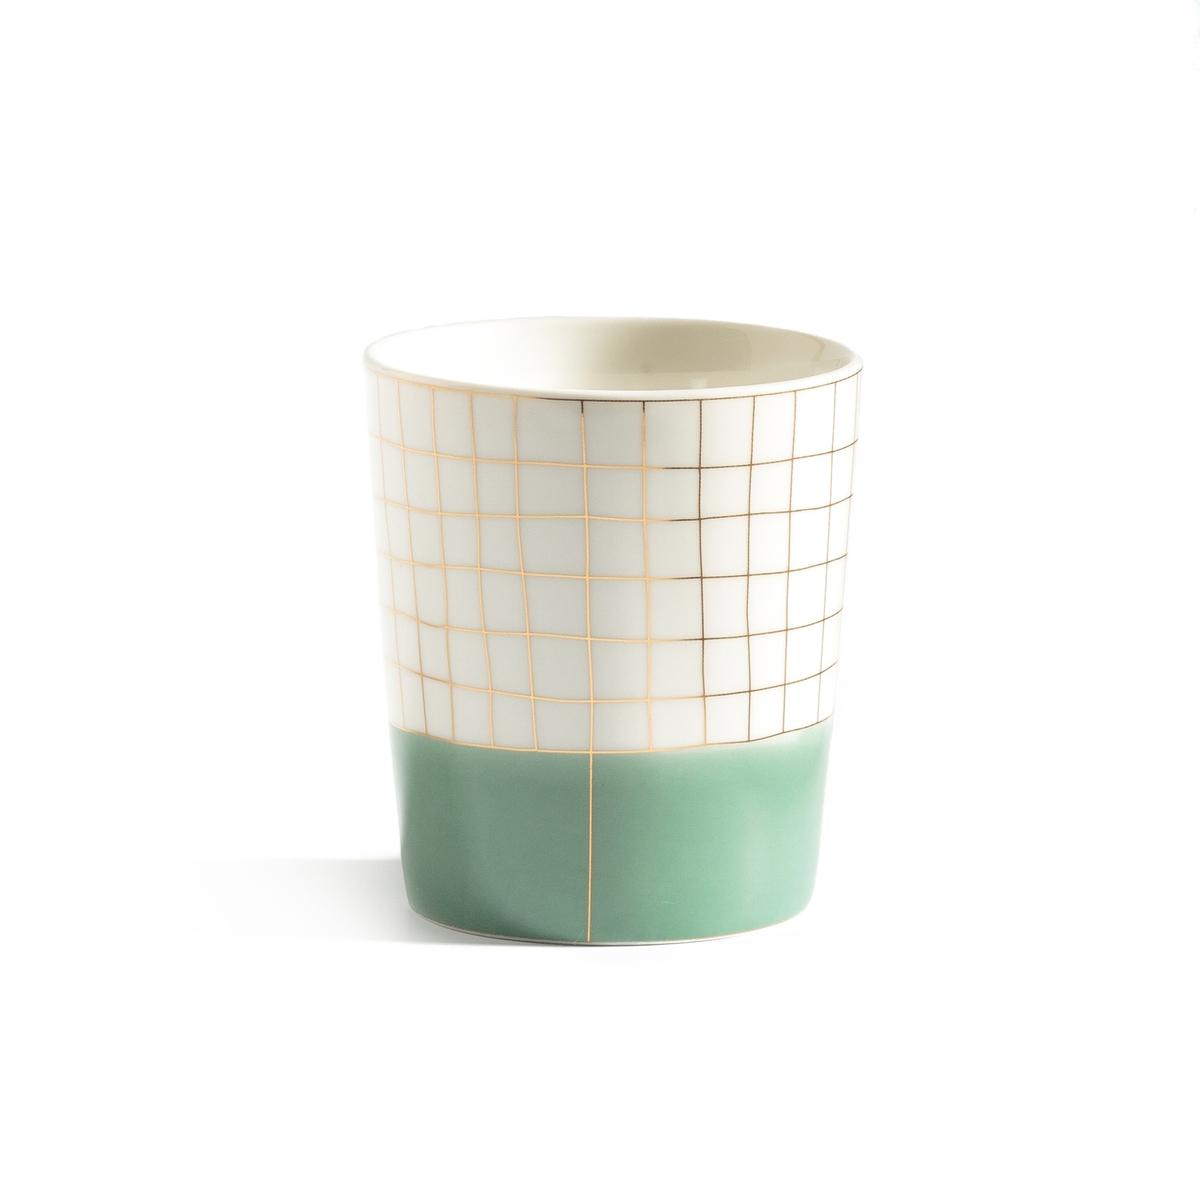 Acao Set of 4 Porcelain Cups